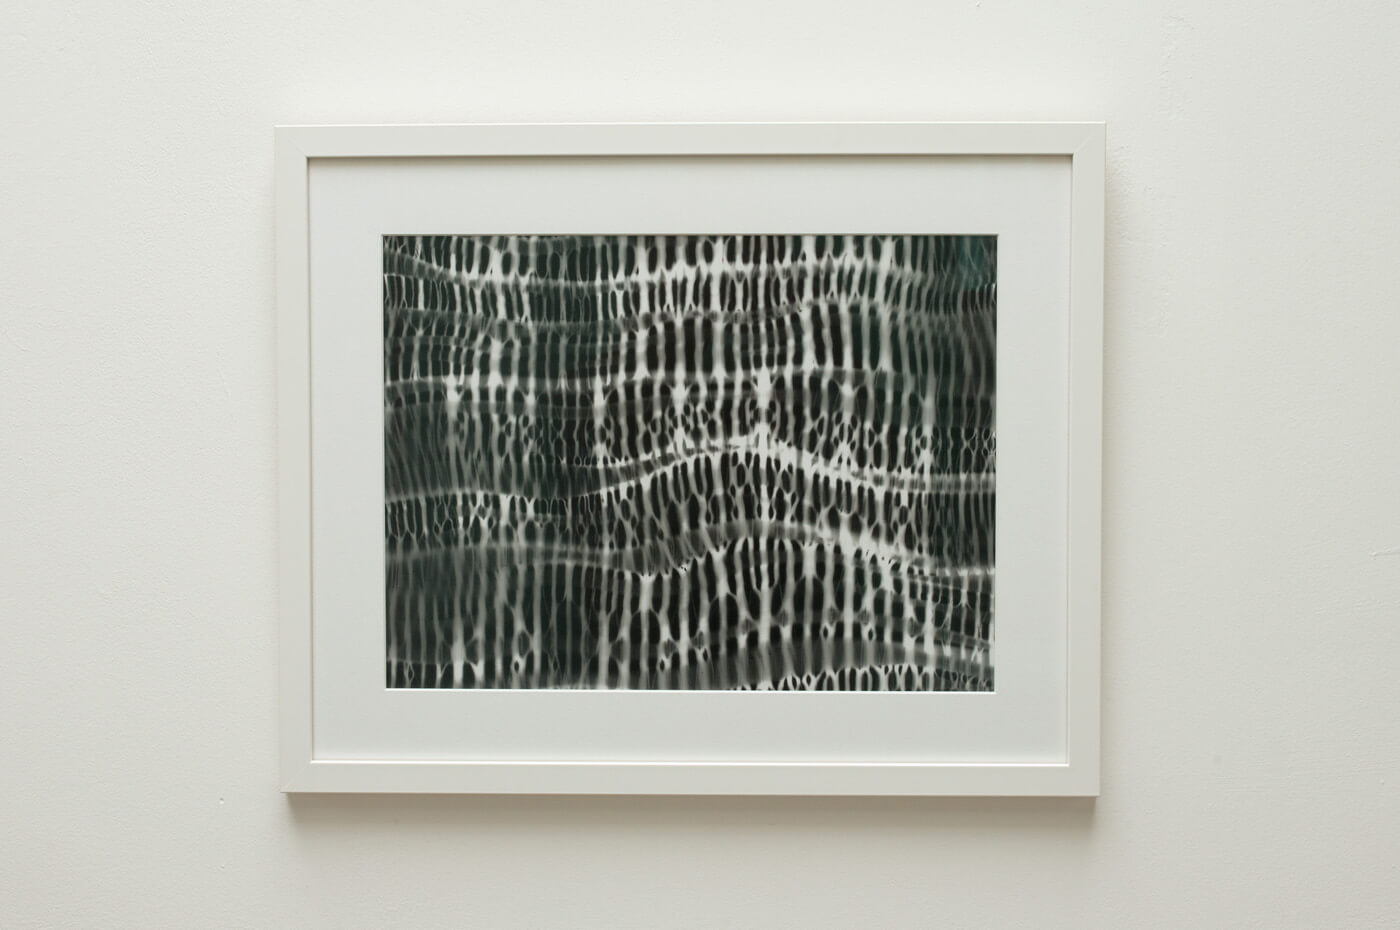 Inner structure No I; 2016 digital resin print, edition of 5 42.5 x 52cm framed 31 x 41.2cm unframed POA